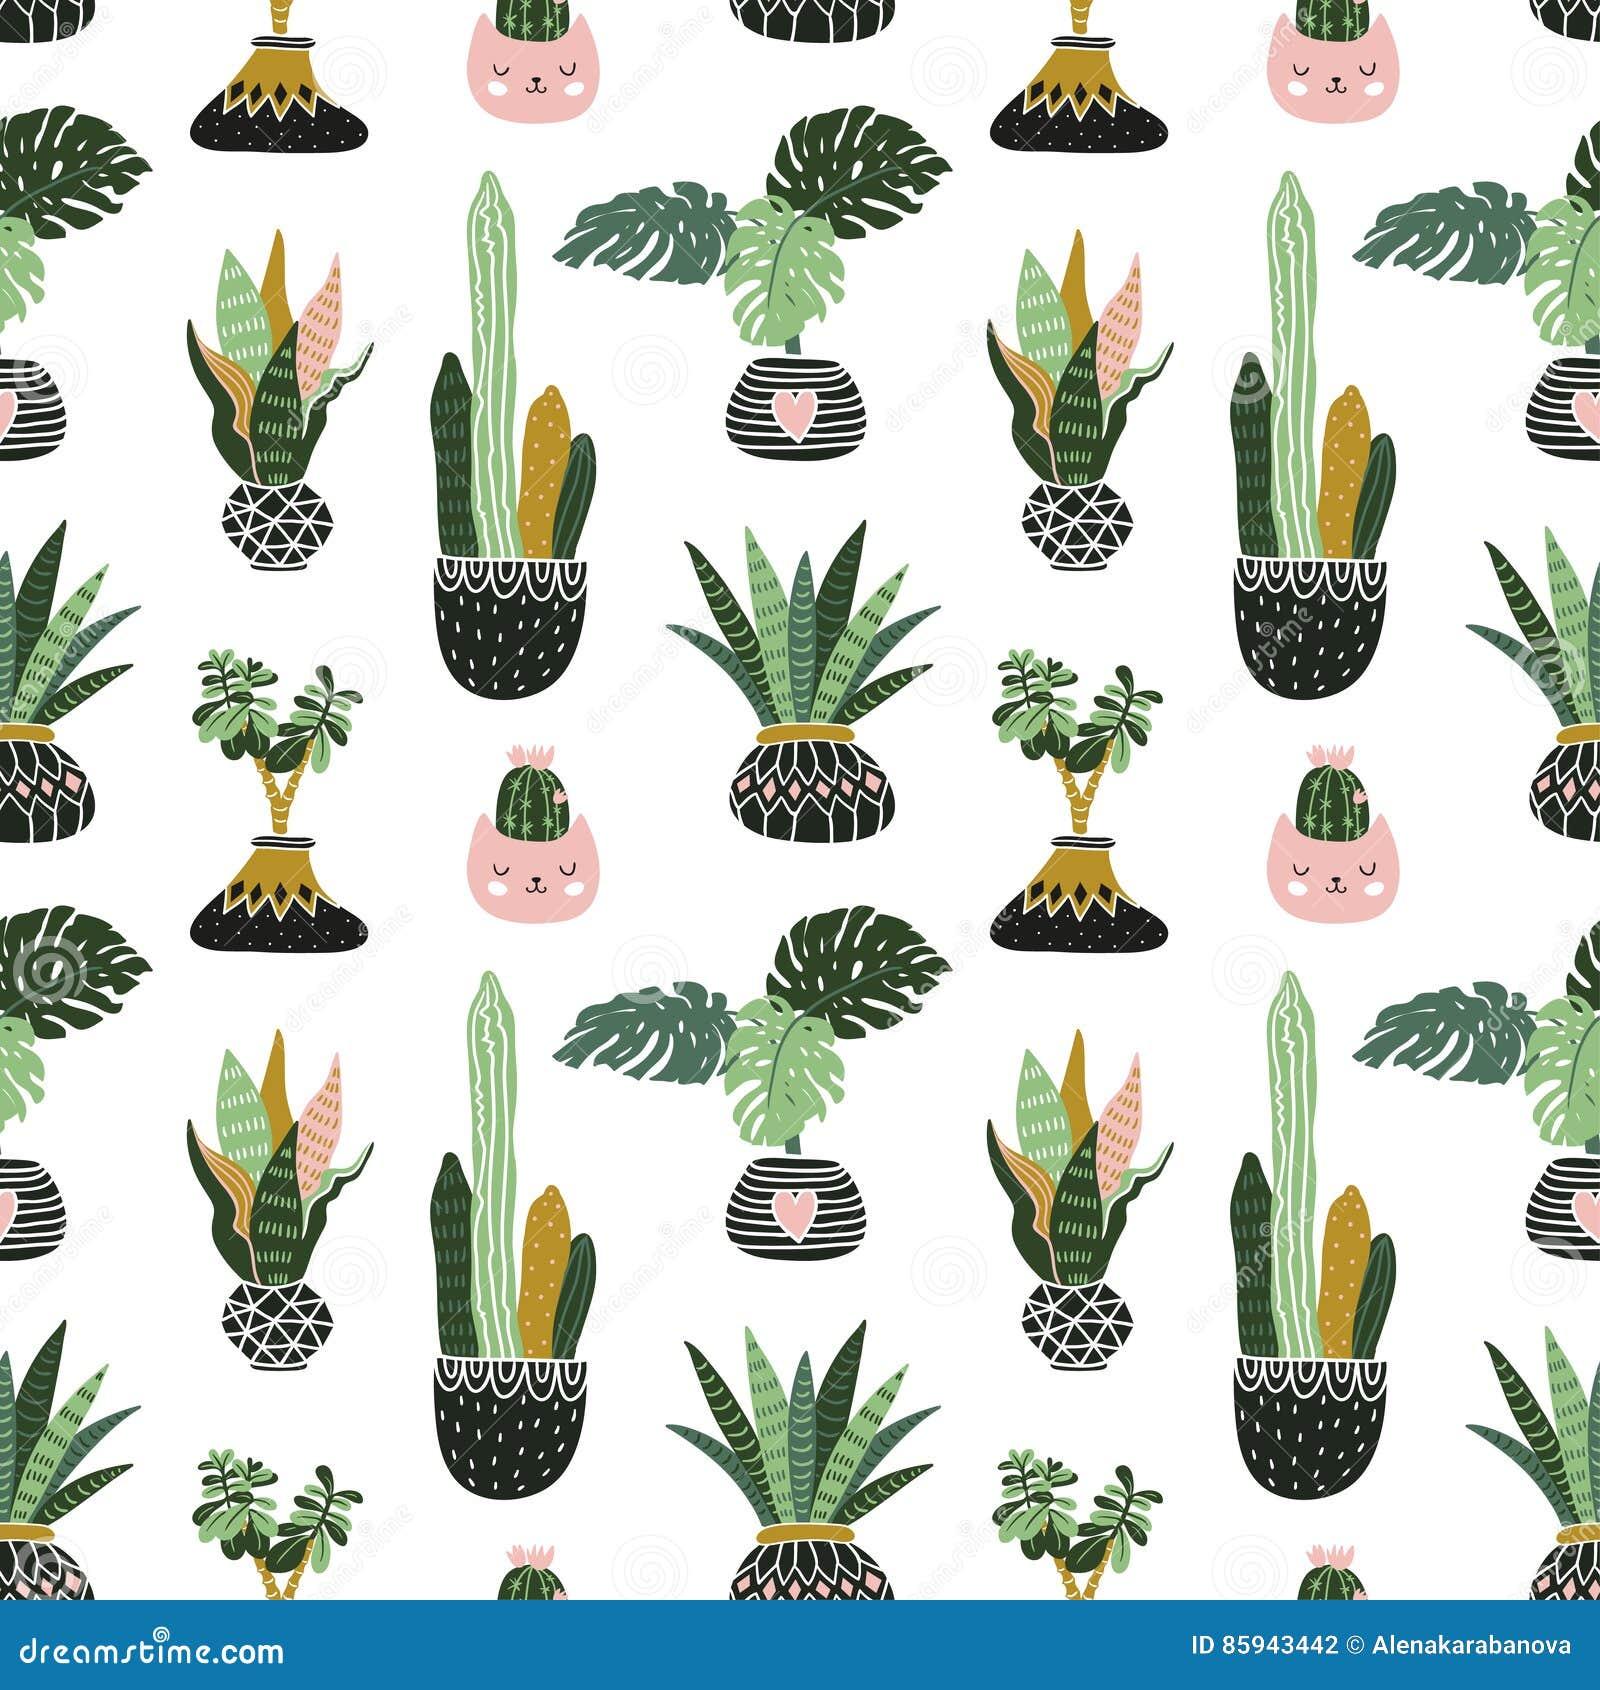 hand drawn tropical house plants. scandinavian style illustration